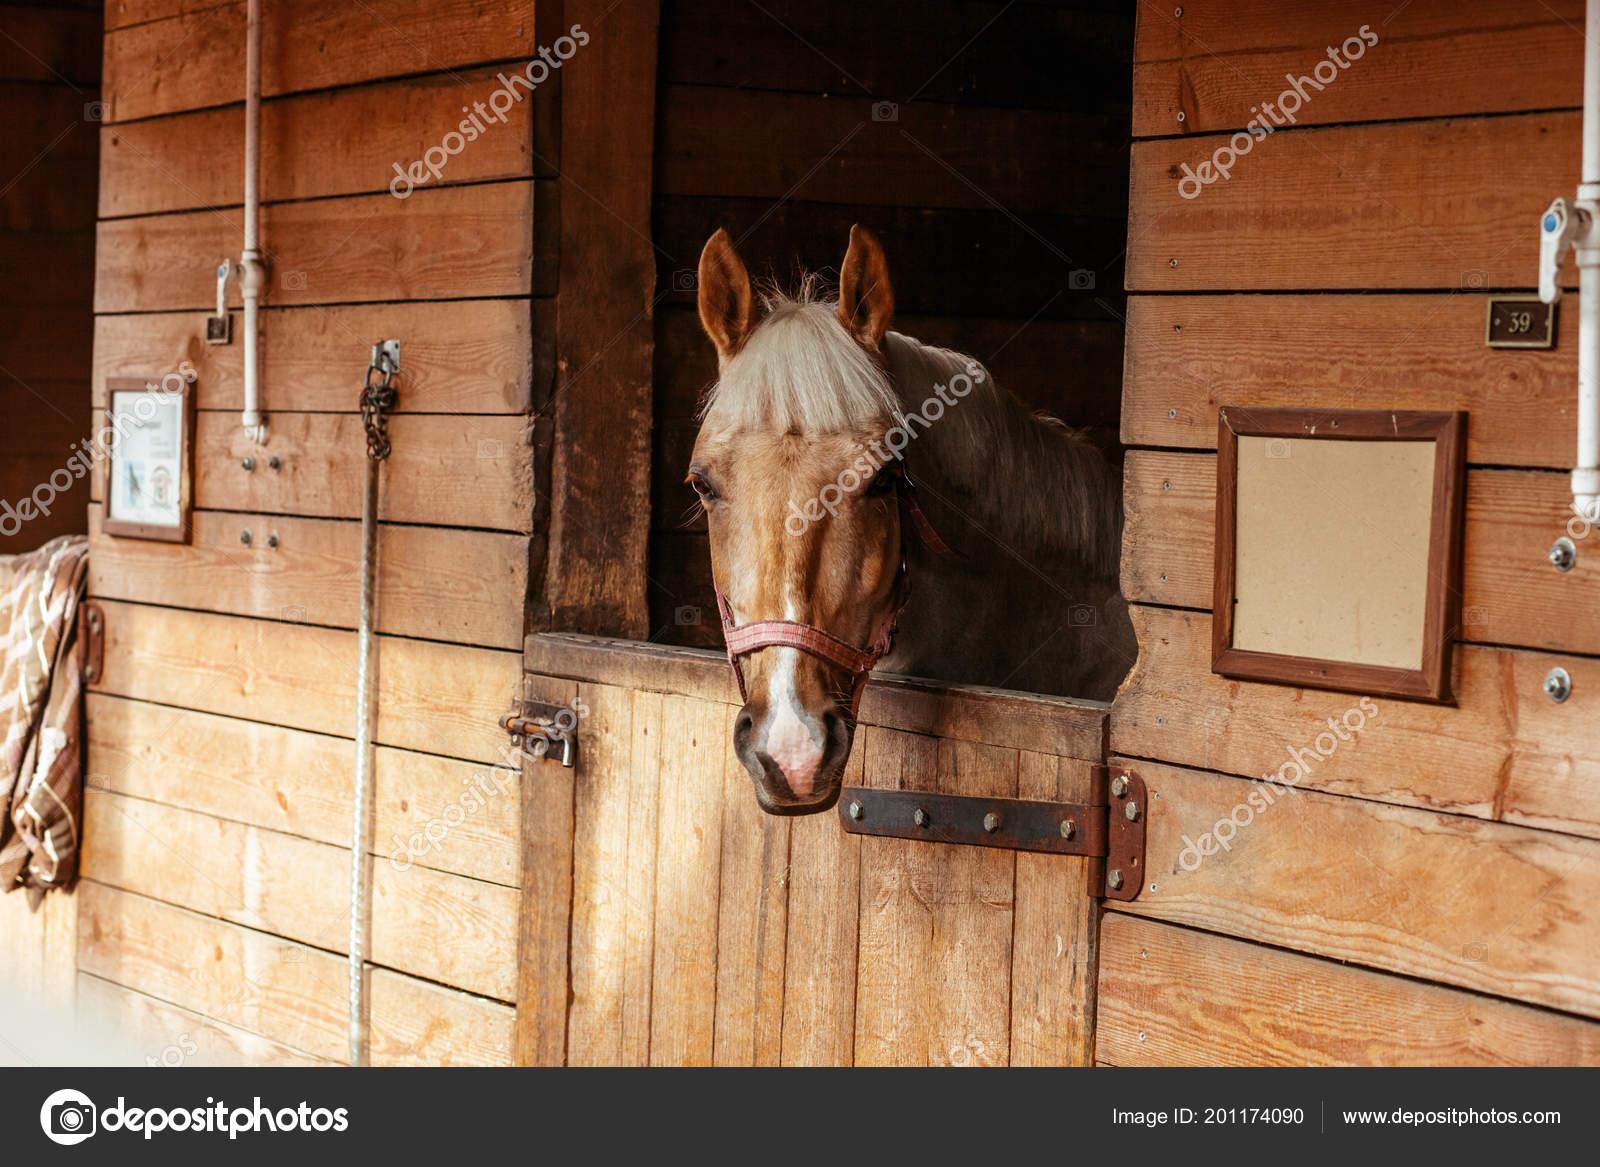 Beautiful Horses Animals Pasture Stables Horseback Riding Stock Photo C Vitizh 201174090